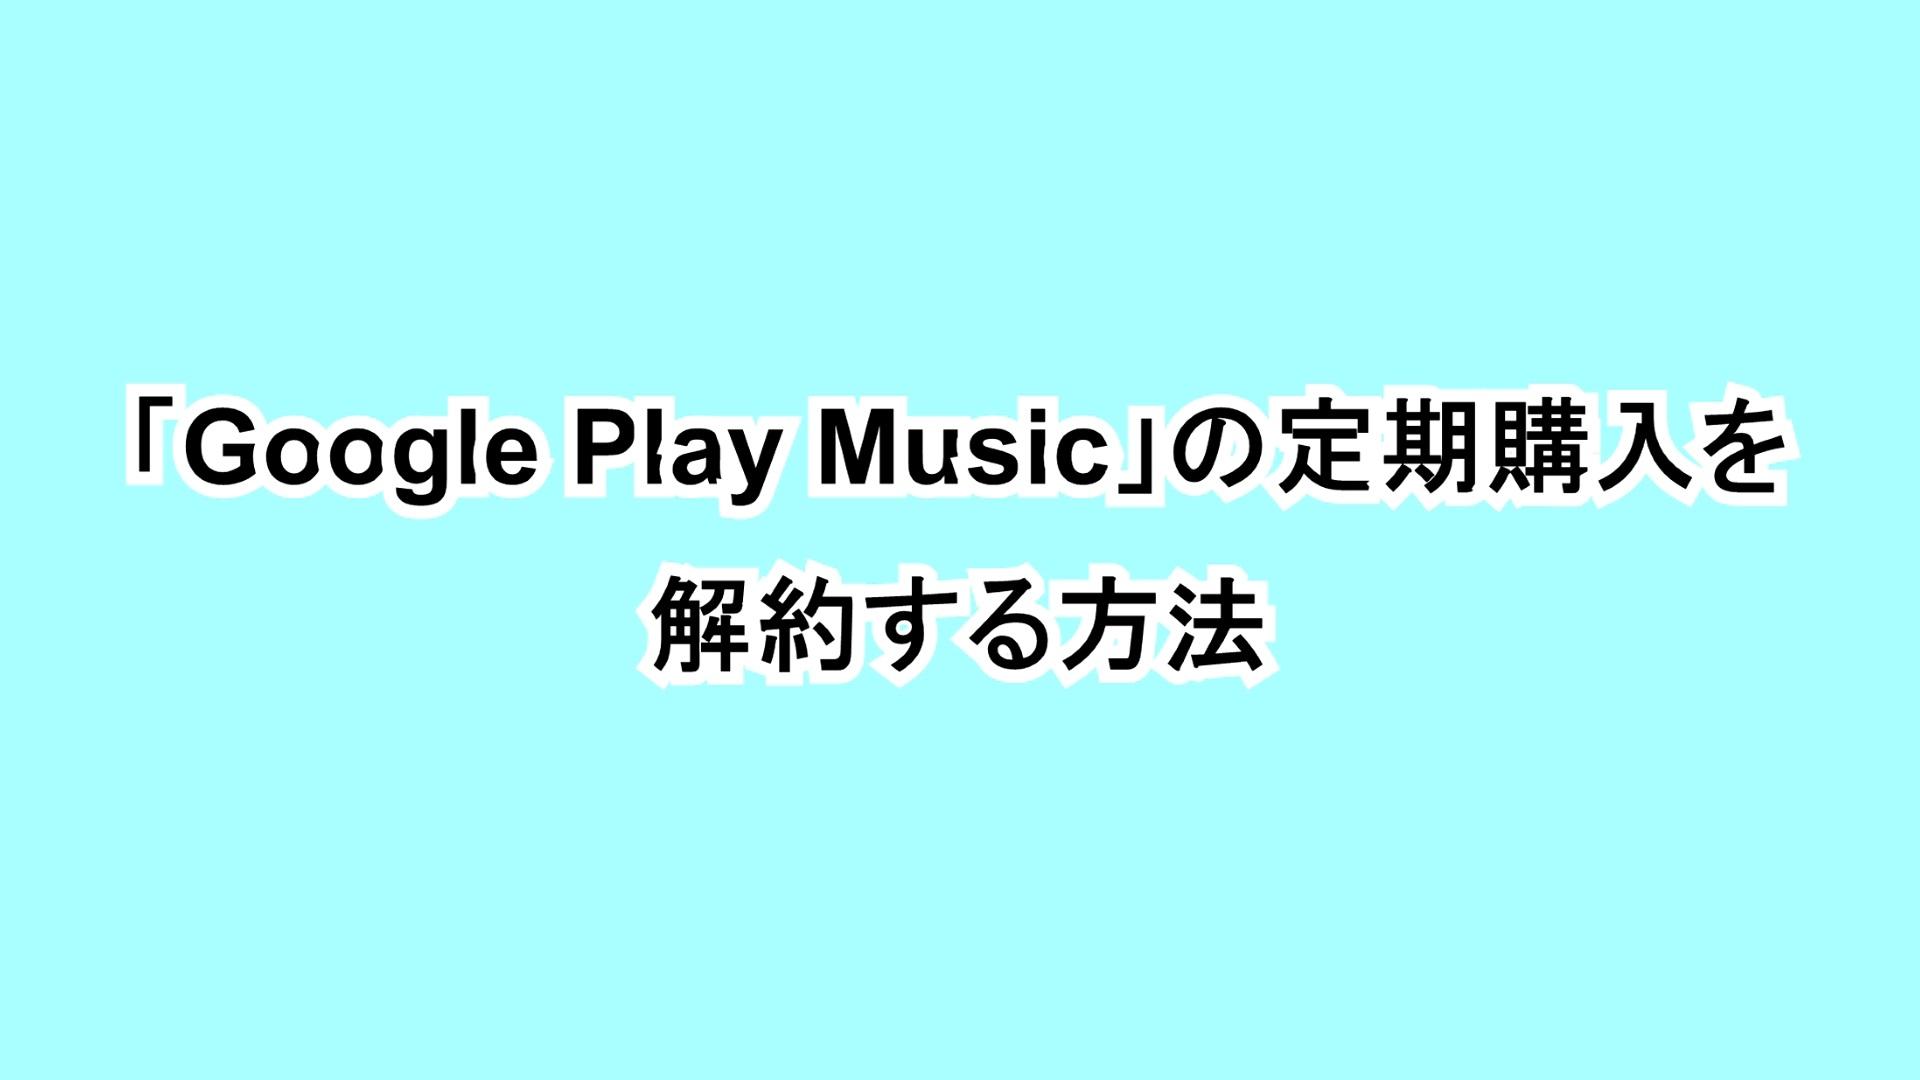 「Google Play Music」の定期購入を解約する方法